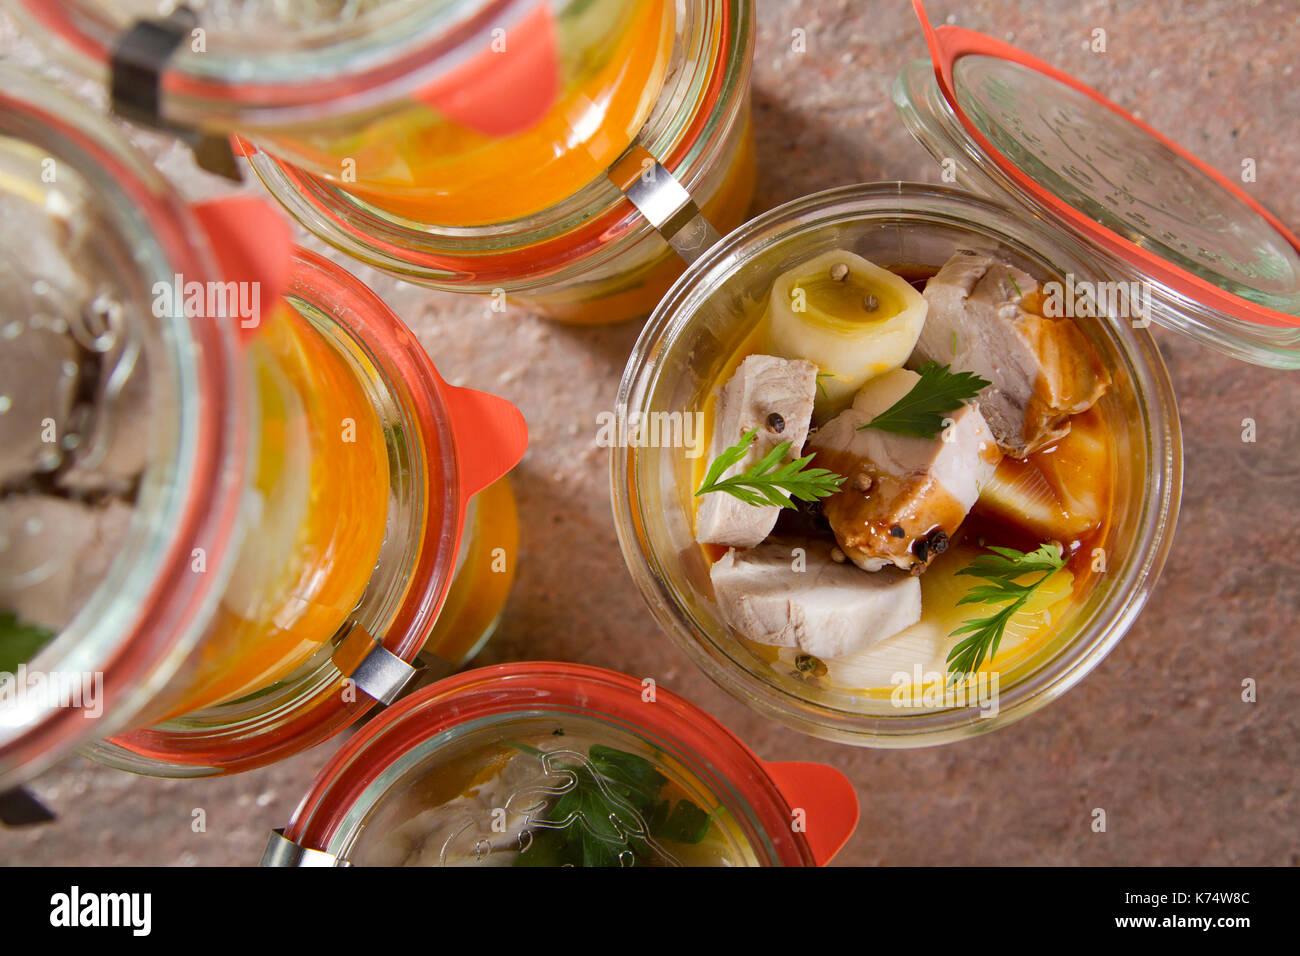 Rack of pork in a preserving jar. - Stock Image